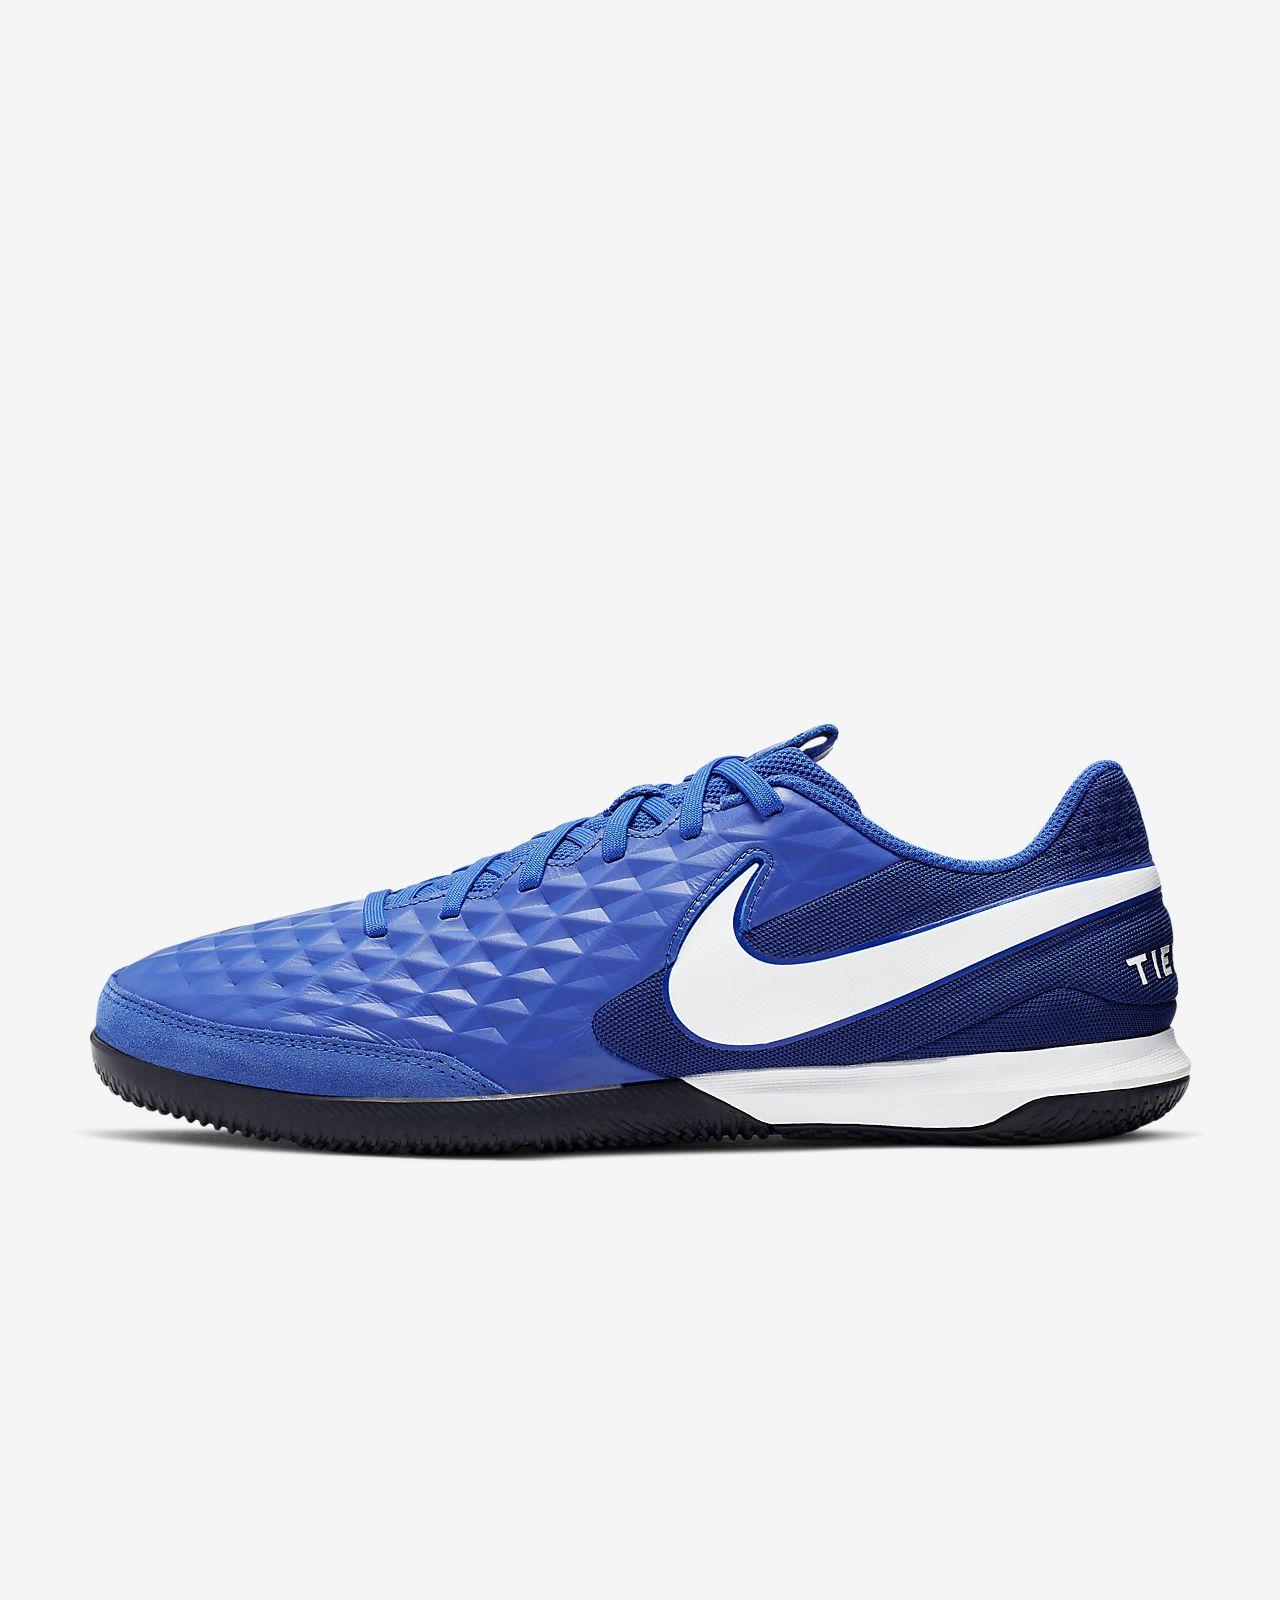 Chaussure de football en salle Nike Tiempo Legend 8 Academy IC